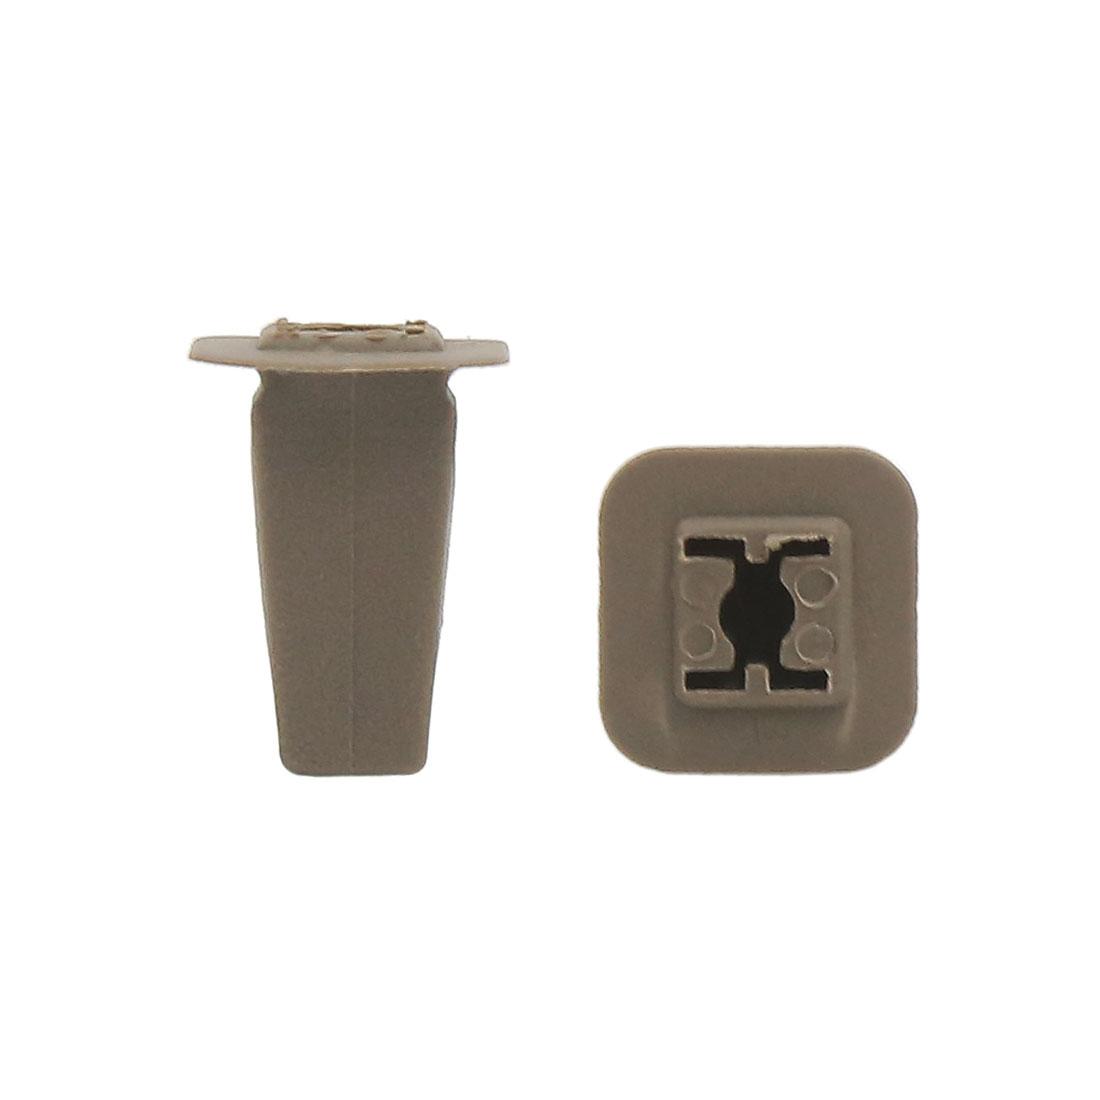 50PCS 9 x 7mm Hole Deep Gray Plastic Rivet Panel Fixings Clips for Car Vehicle